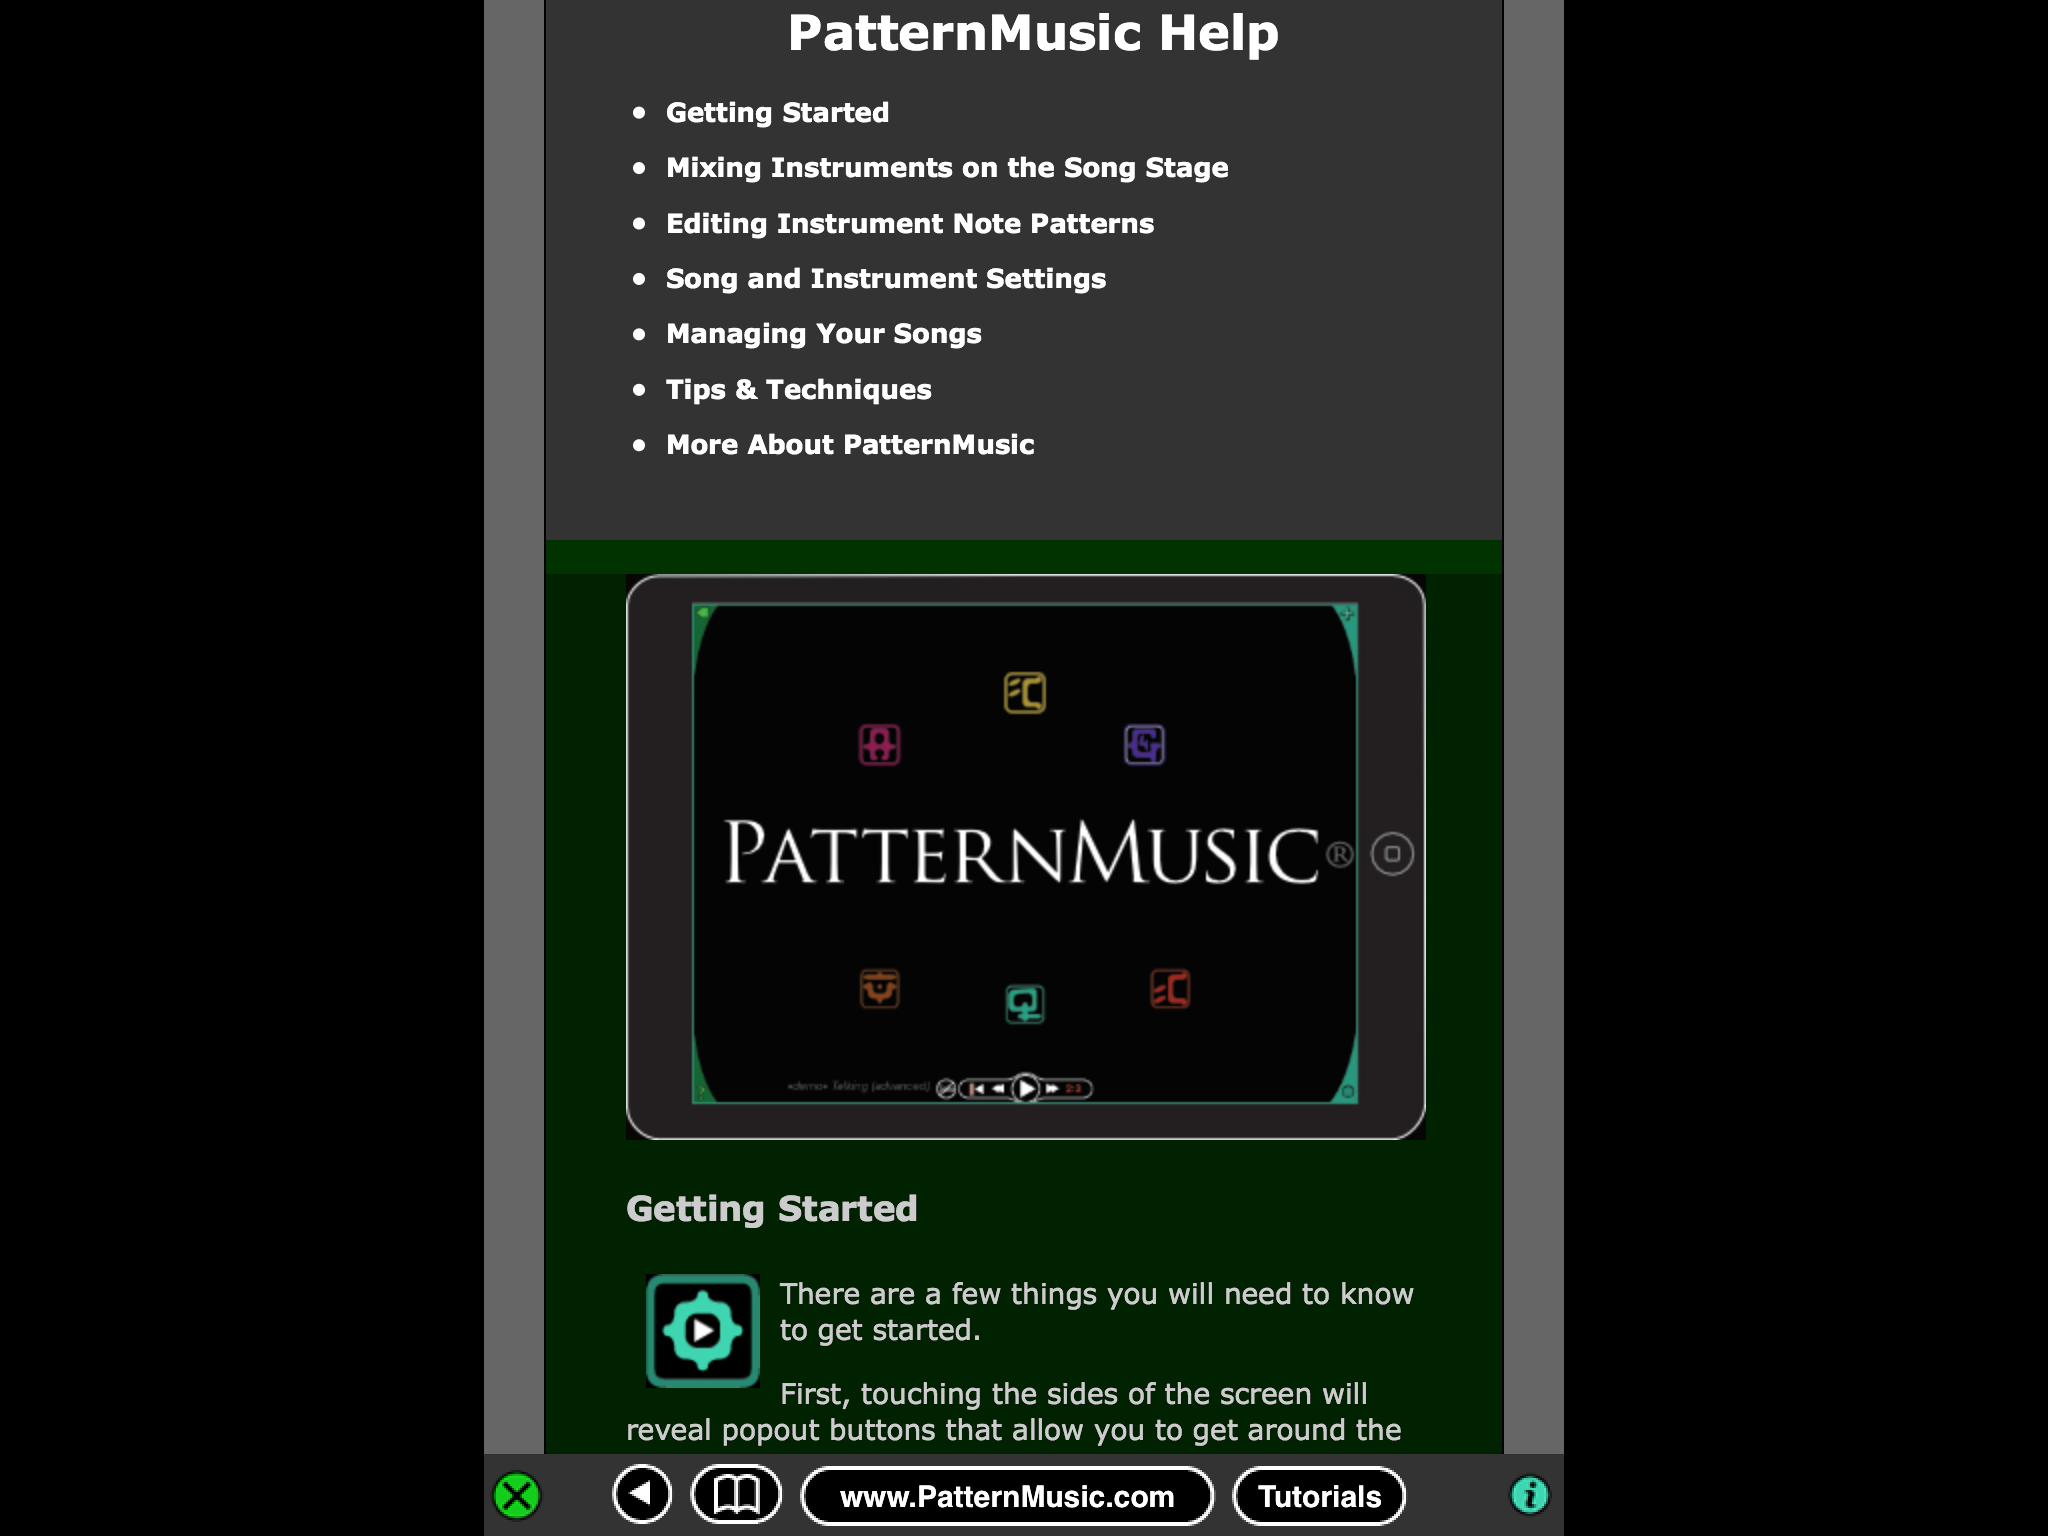 PatternMusic app help panel